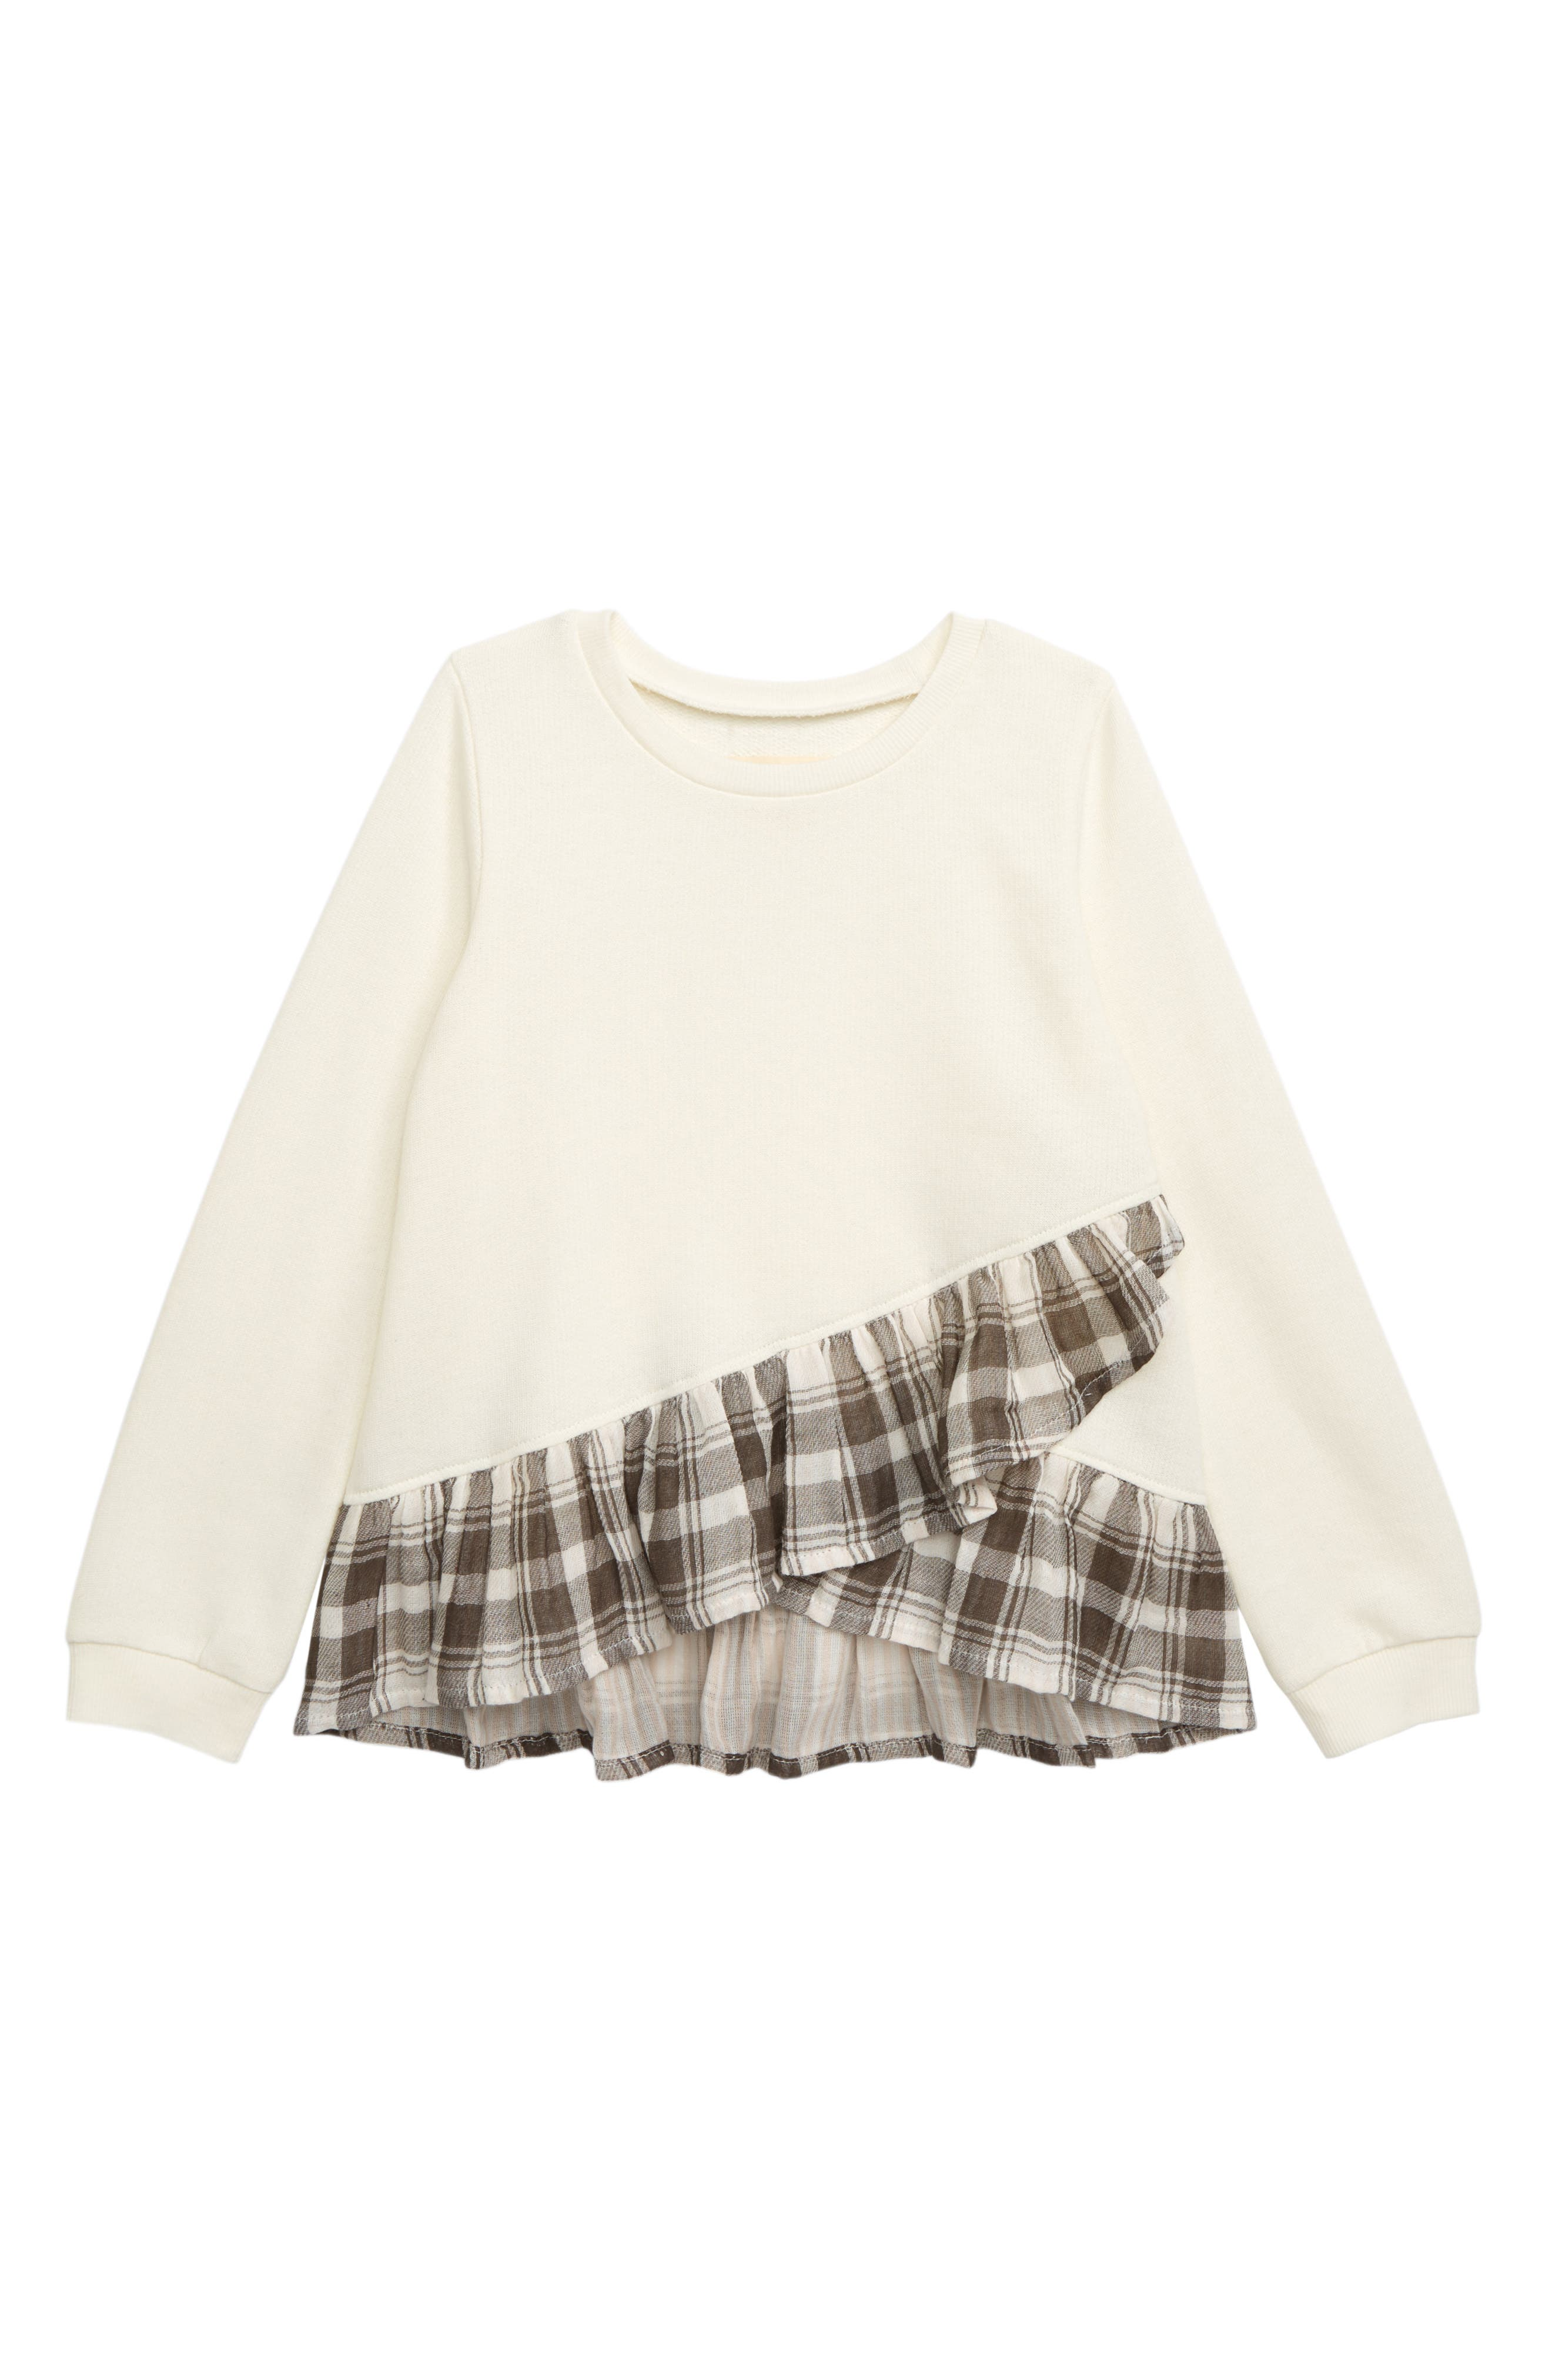 Toddler Girls Tucker  Tate Ruffle Hem Sweatshirt Size 3T  Ivory